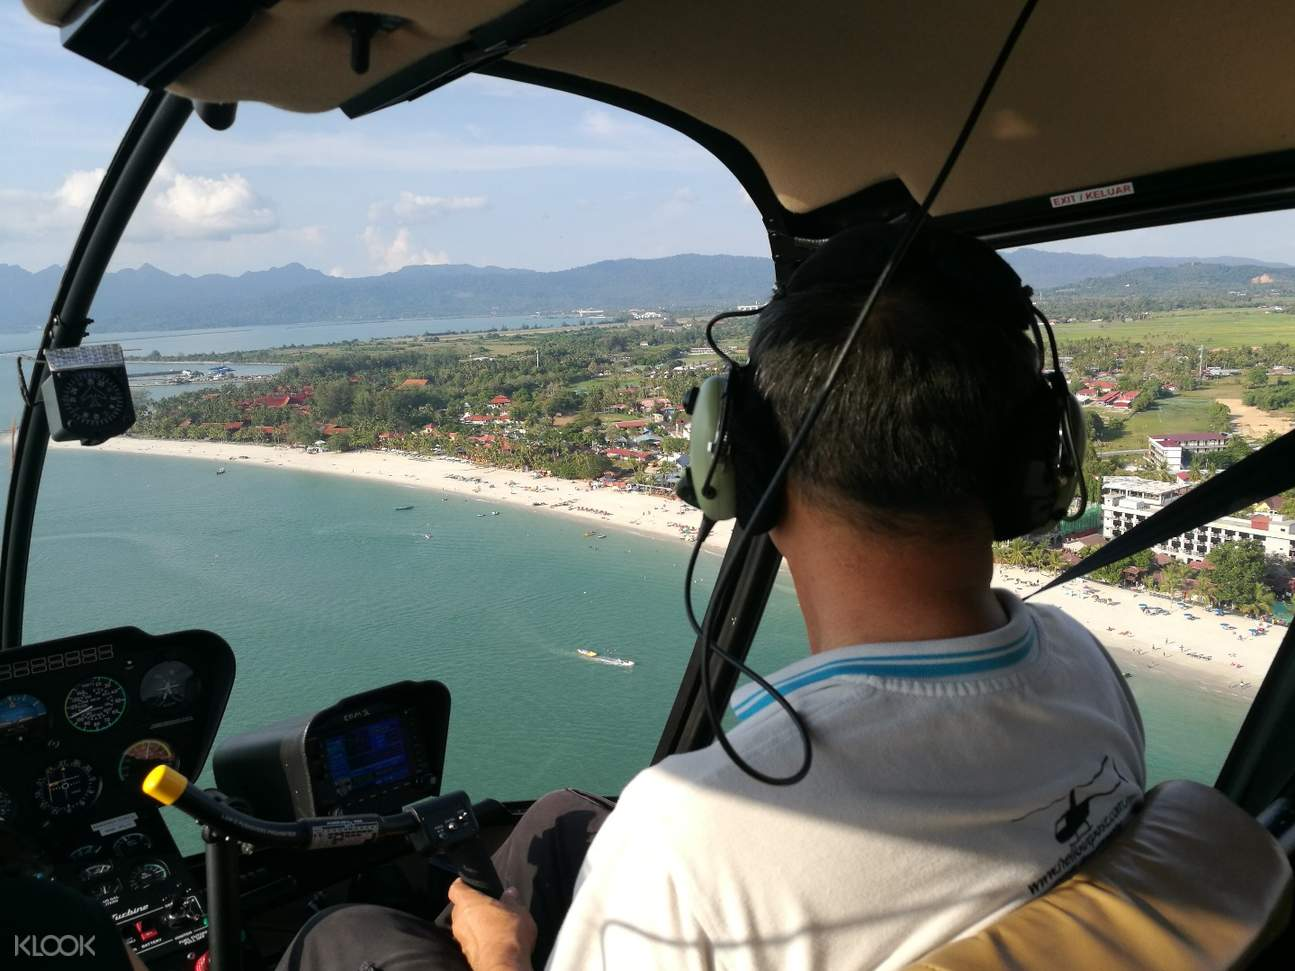 langkawi helicopter english speaking guide